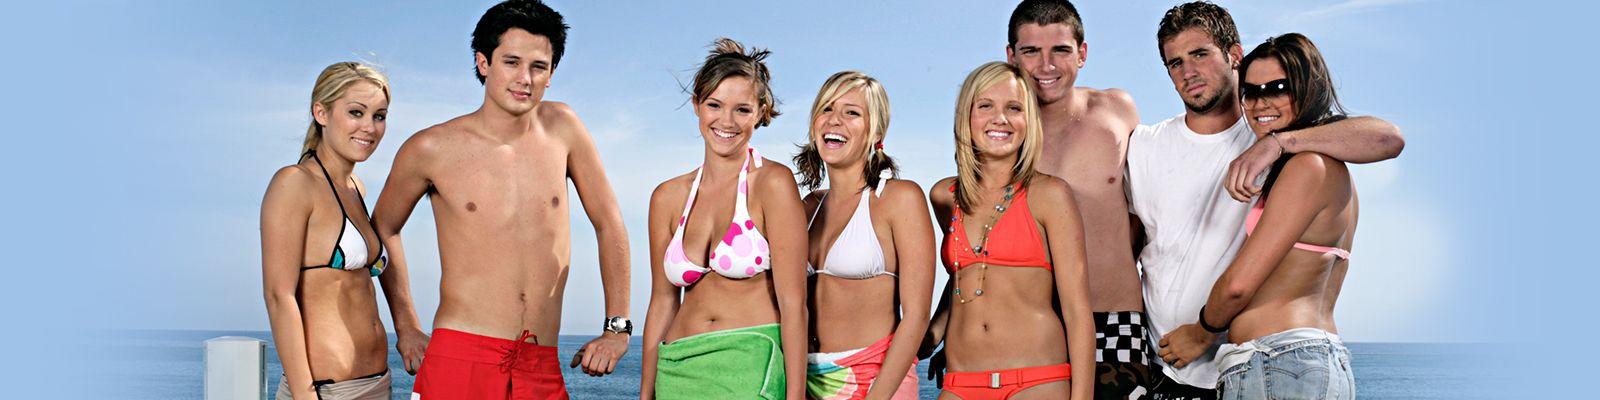 Laguna Beach Watch Full Episodes MTV